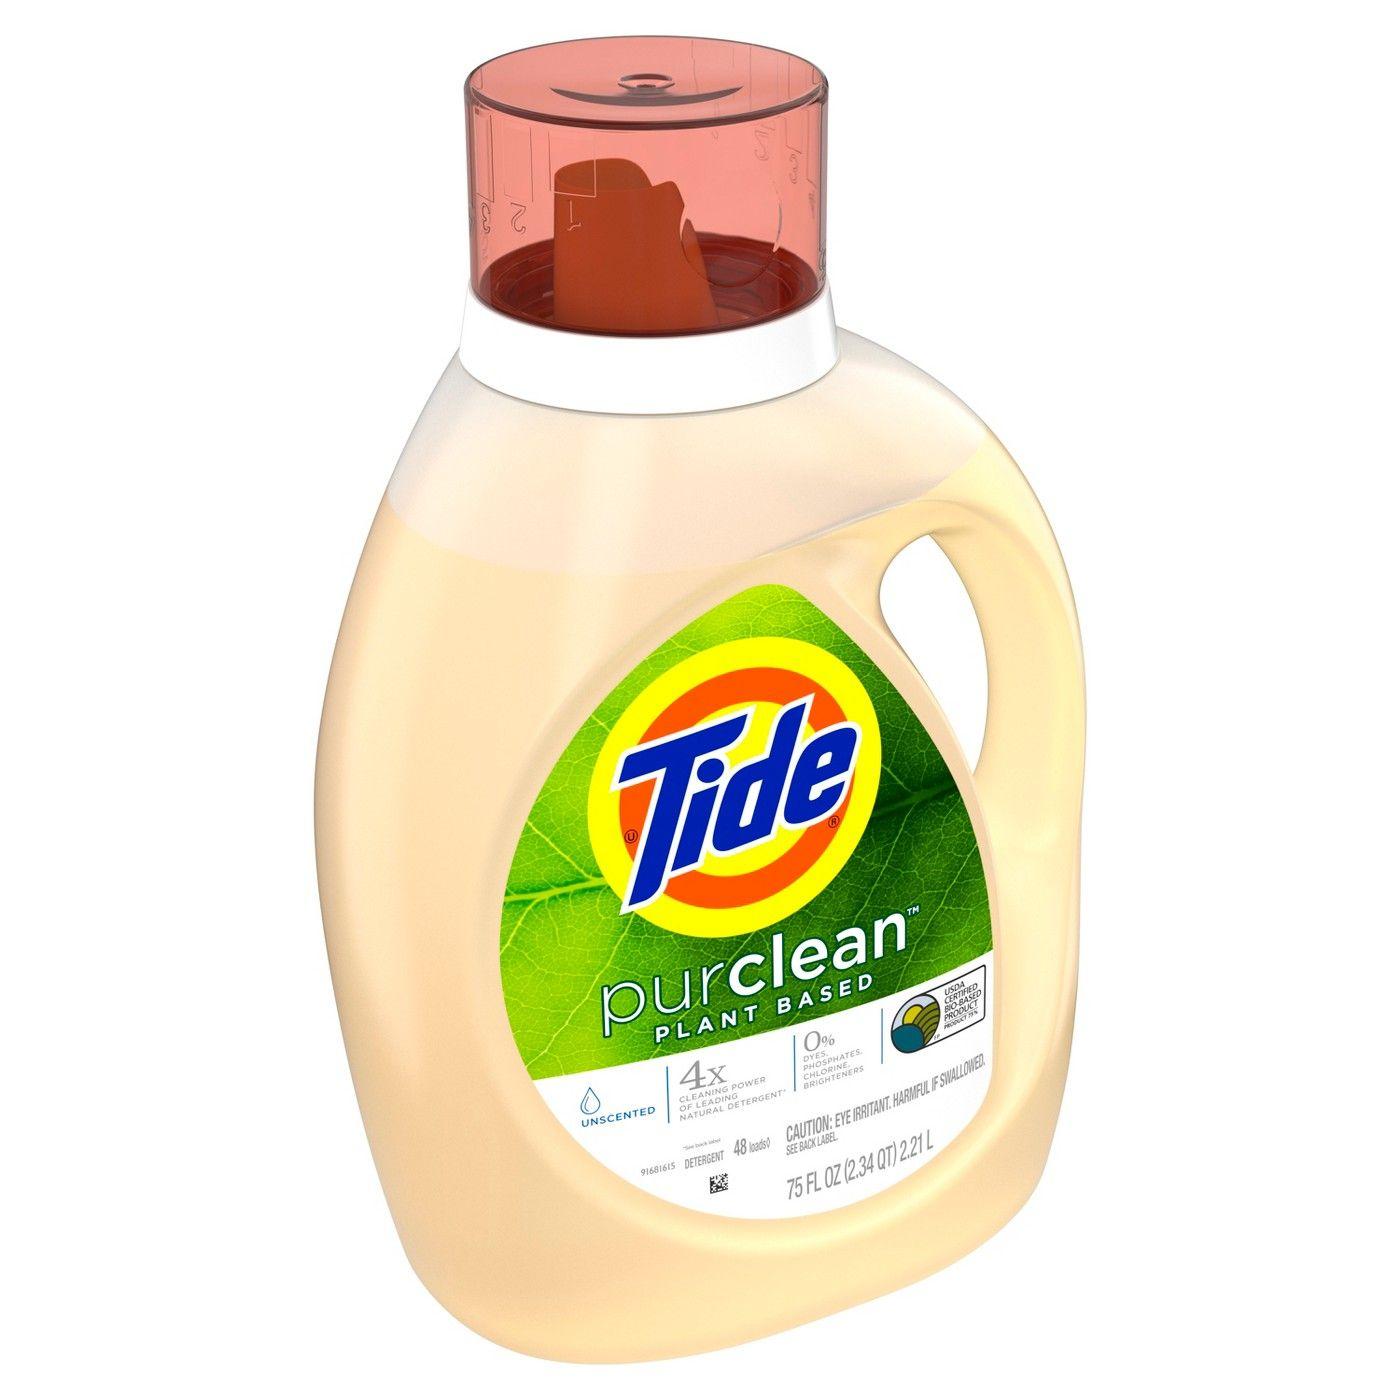 Tide Purclean Plant Based Unscented Liquid Laundry Detergent 75 Fl Oz Image 1 Of 5